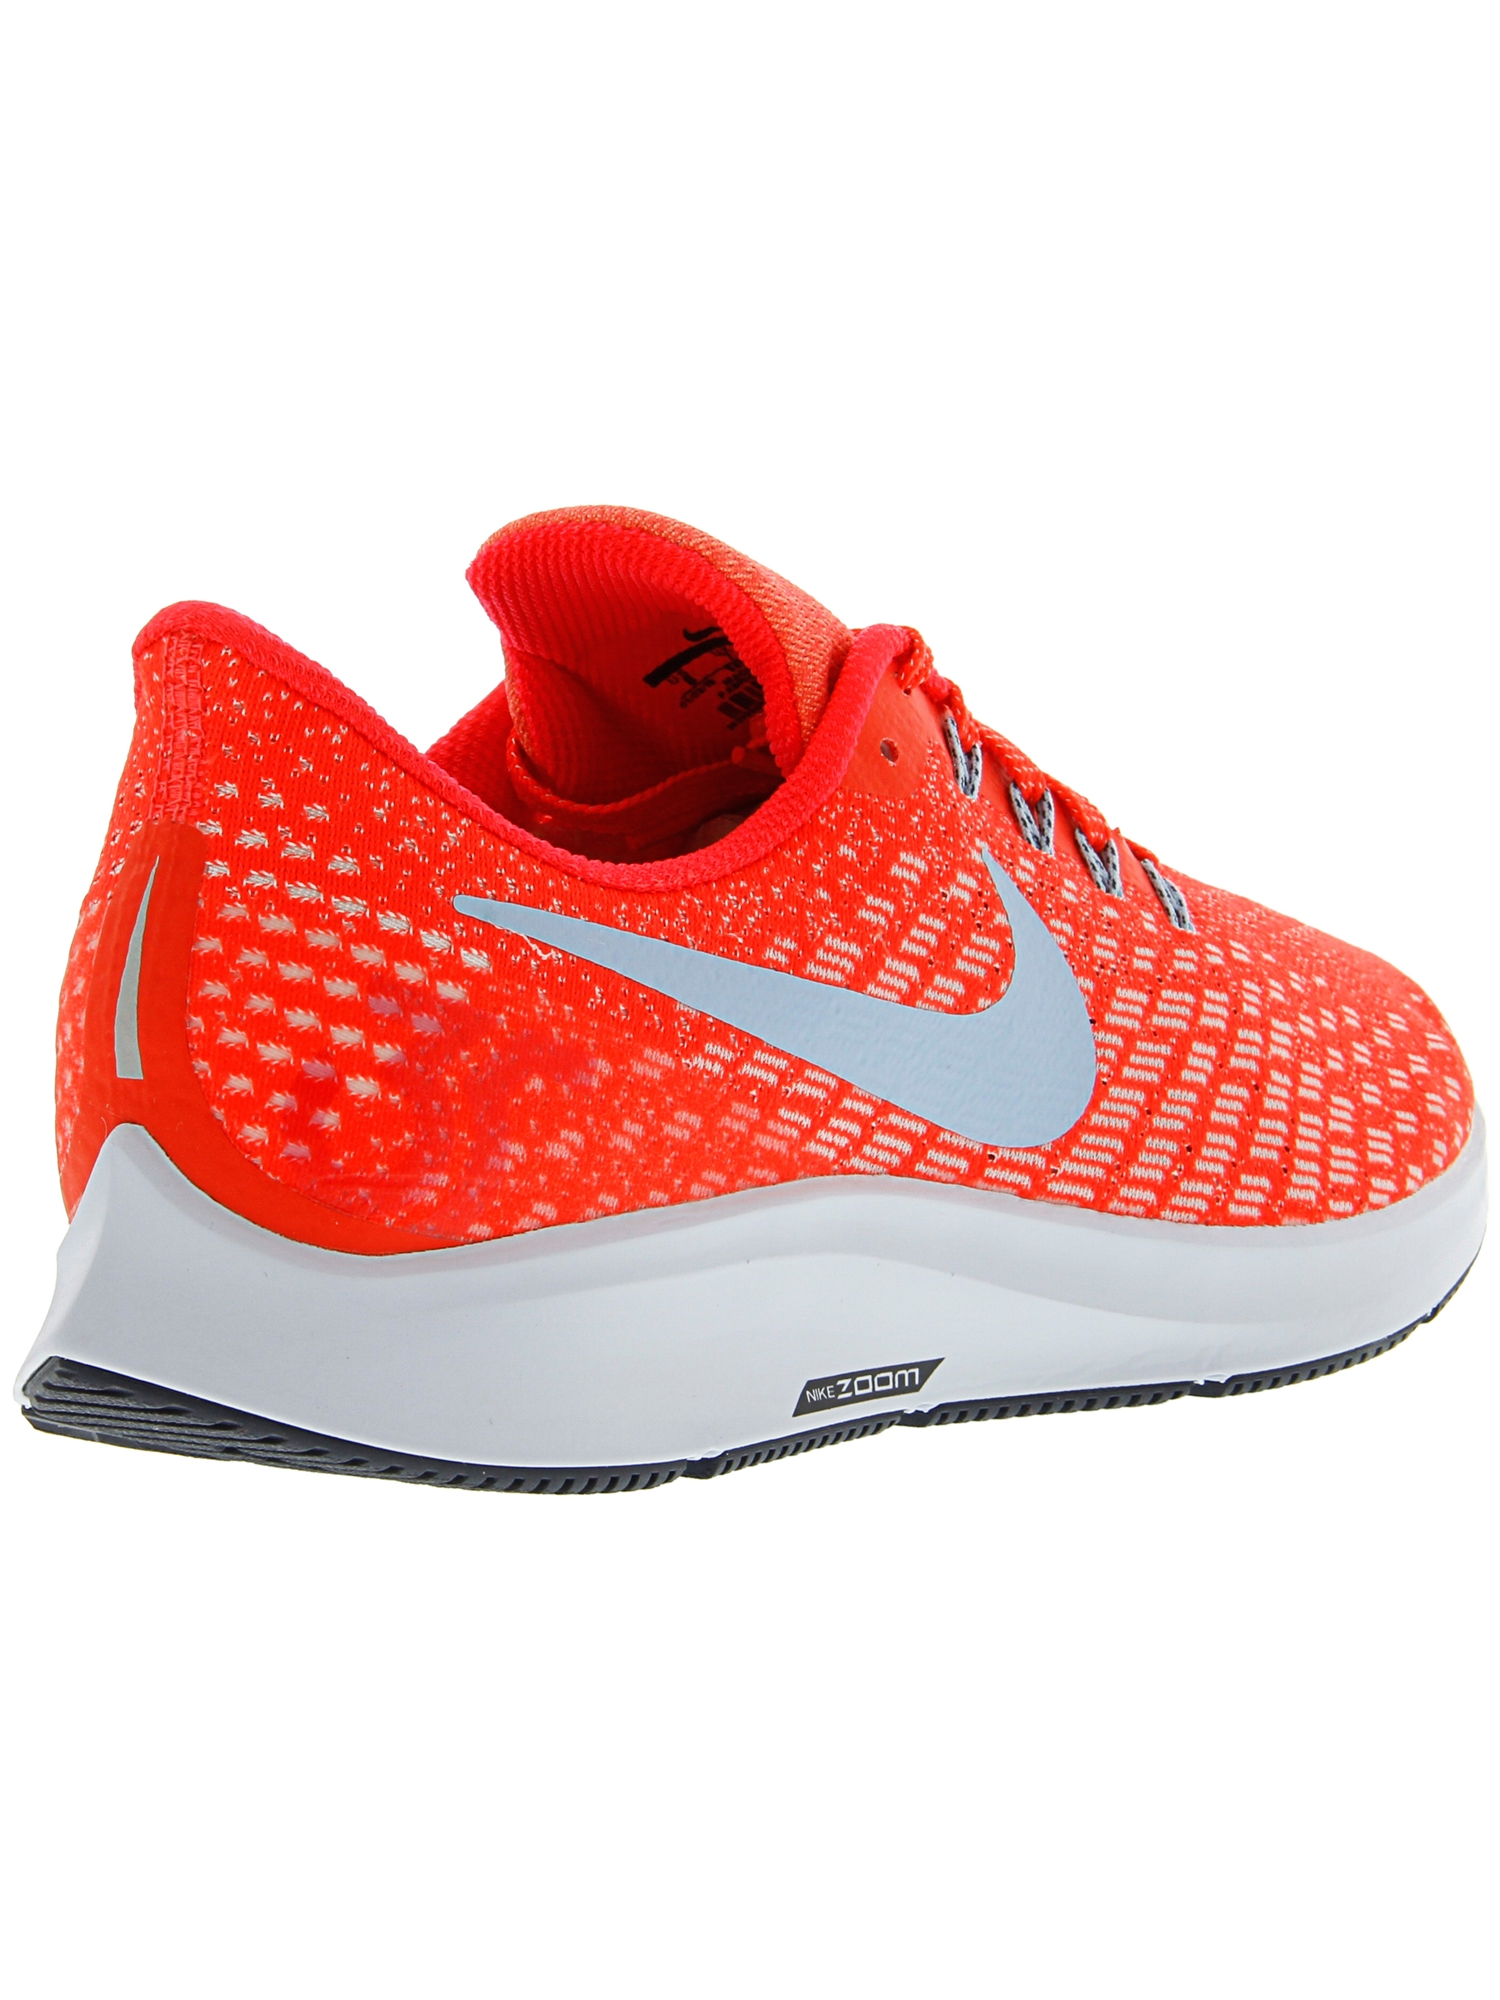 cb4d30ba82b4 Nike - Nike Men s Air Zoom Pegasus 35 Bright Crimson   Ice Blue - Sail  Ankle-High Mesh Running Shoe 10.5M - Walmart.com